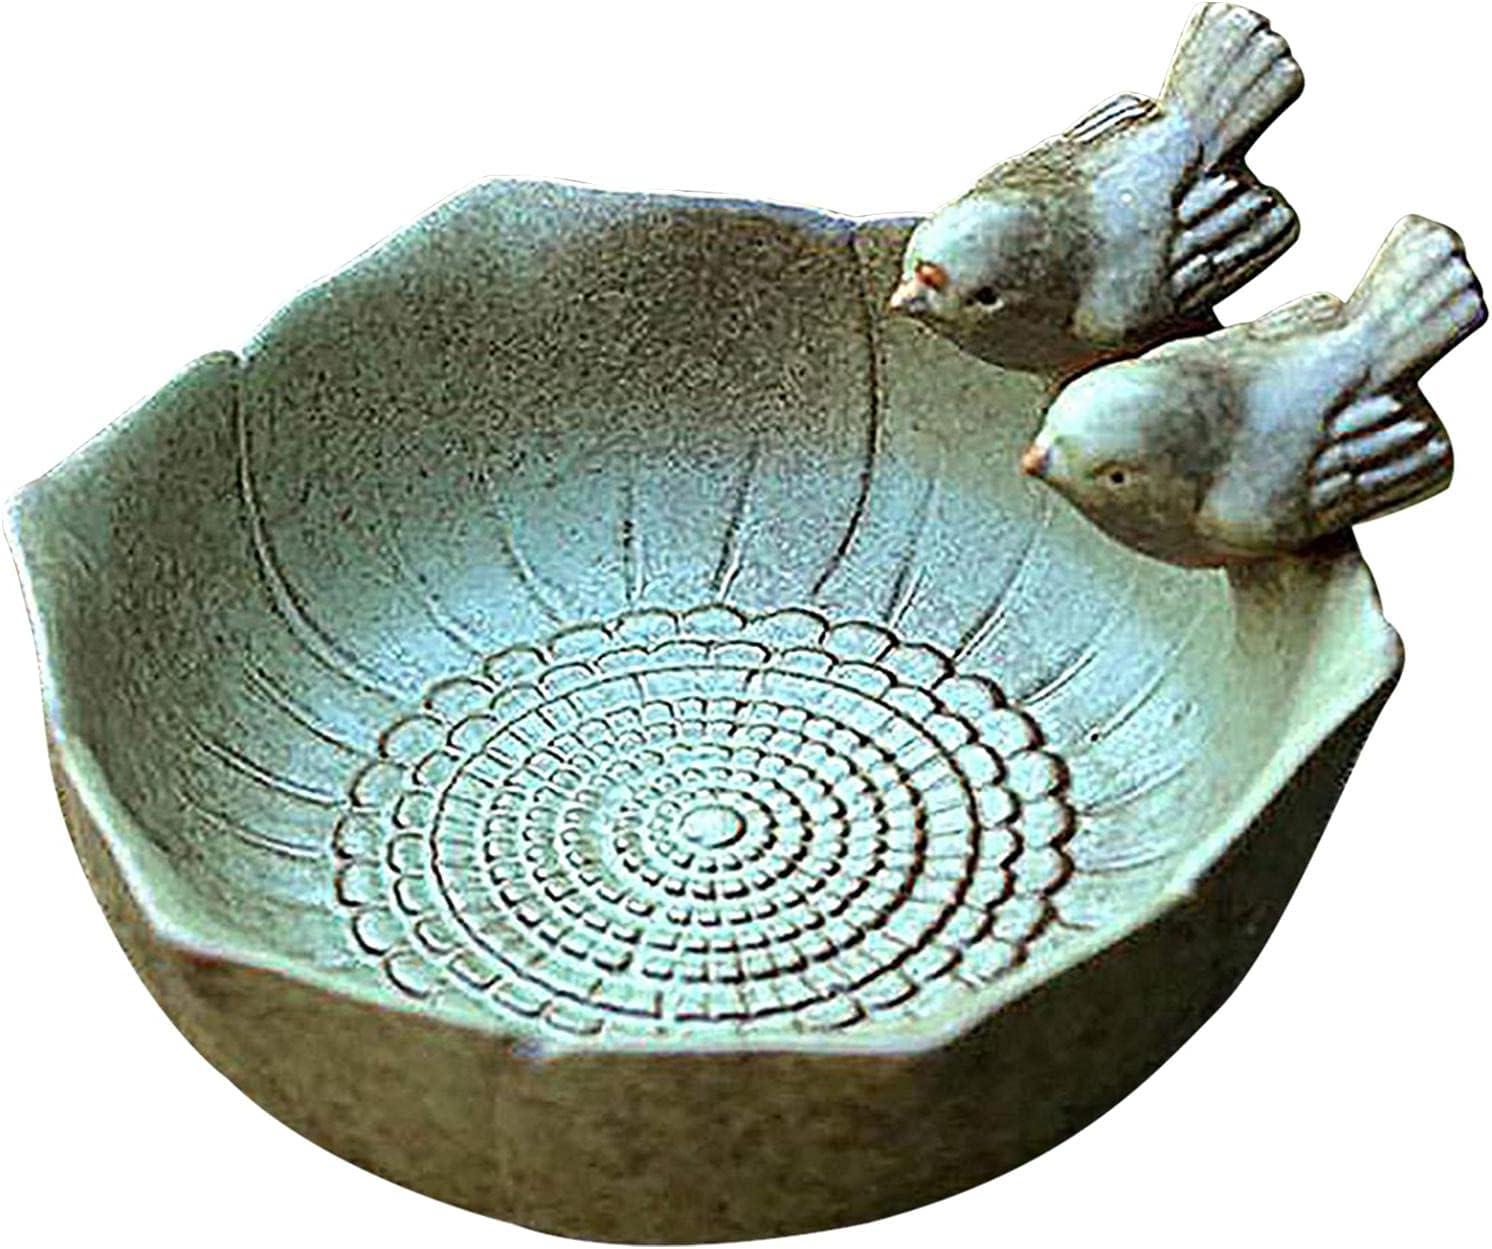 Poiuqew Ceramic Limited price sale Bird Special Campaign Feeder Feeding Bowl Tray 630630315inch